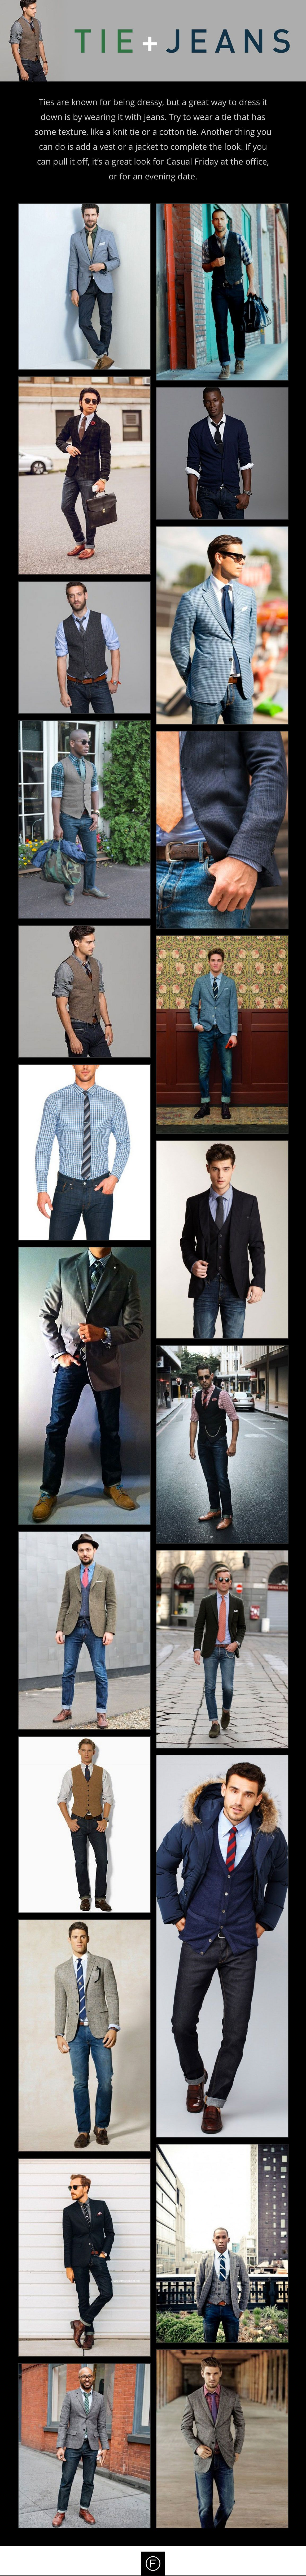 ecb289e34 Fashion styles 2015